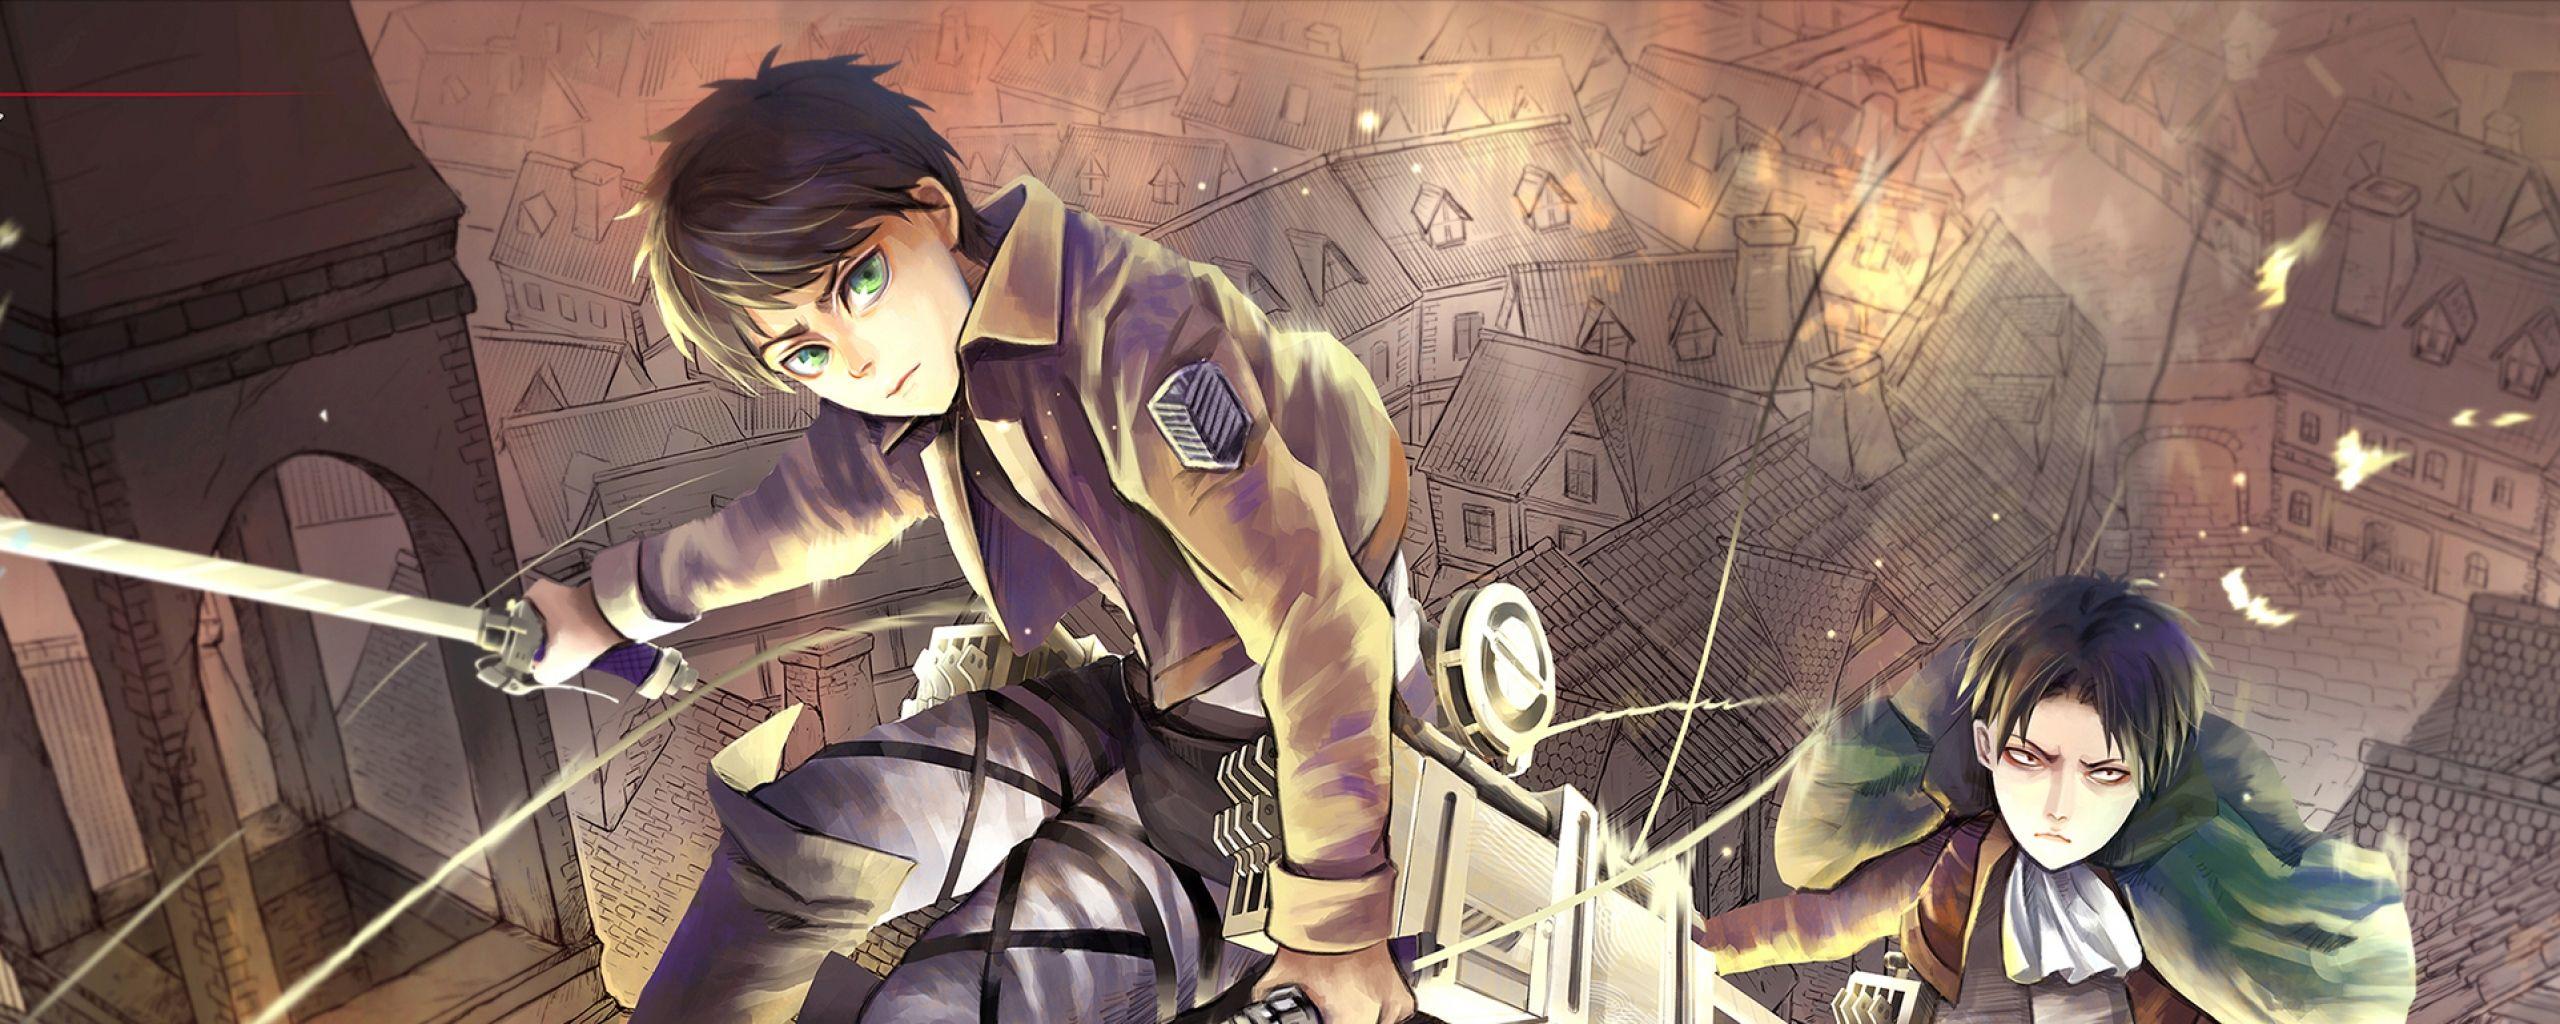 Fantastic Wallpaper Naruto Dual Monitor - fac04019d74cc294626e2ccaa5cd2c01  Picture_572434.jpg